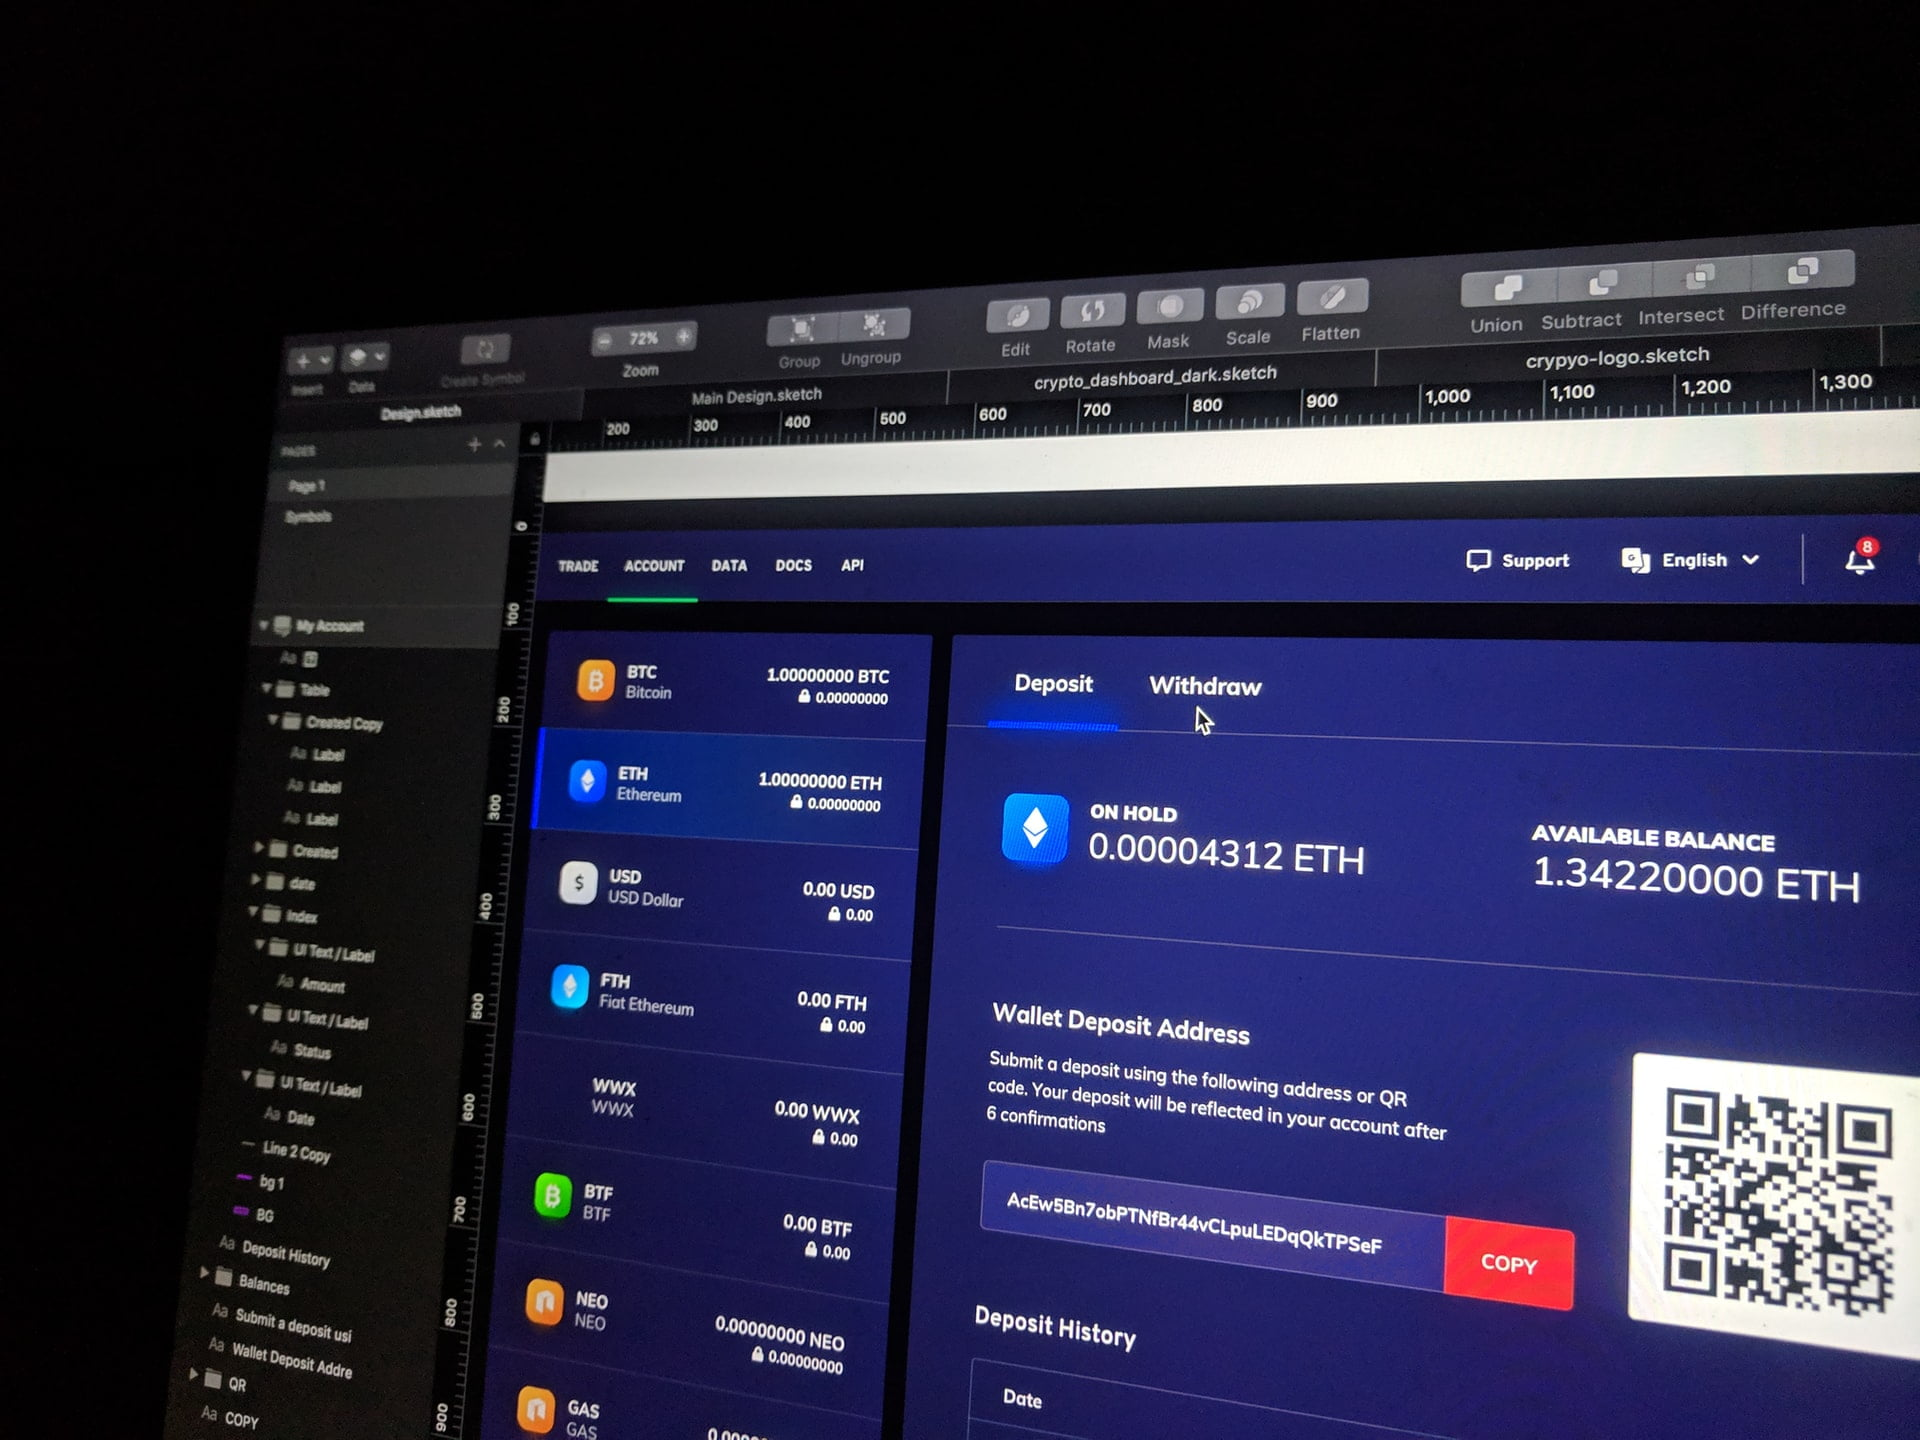 A screenshot of crypto forum online market